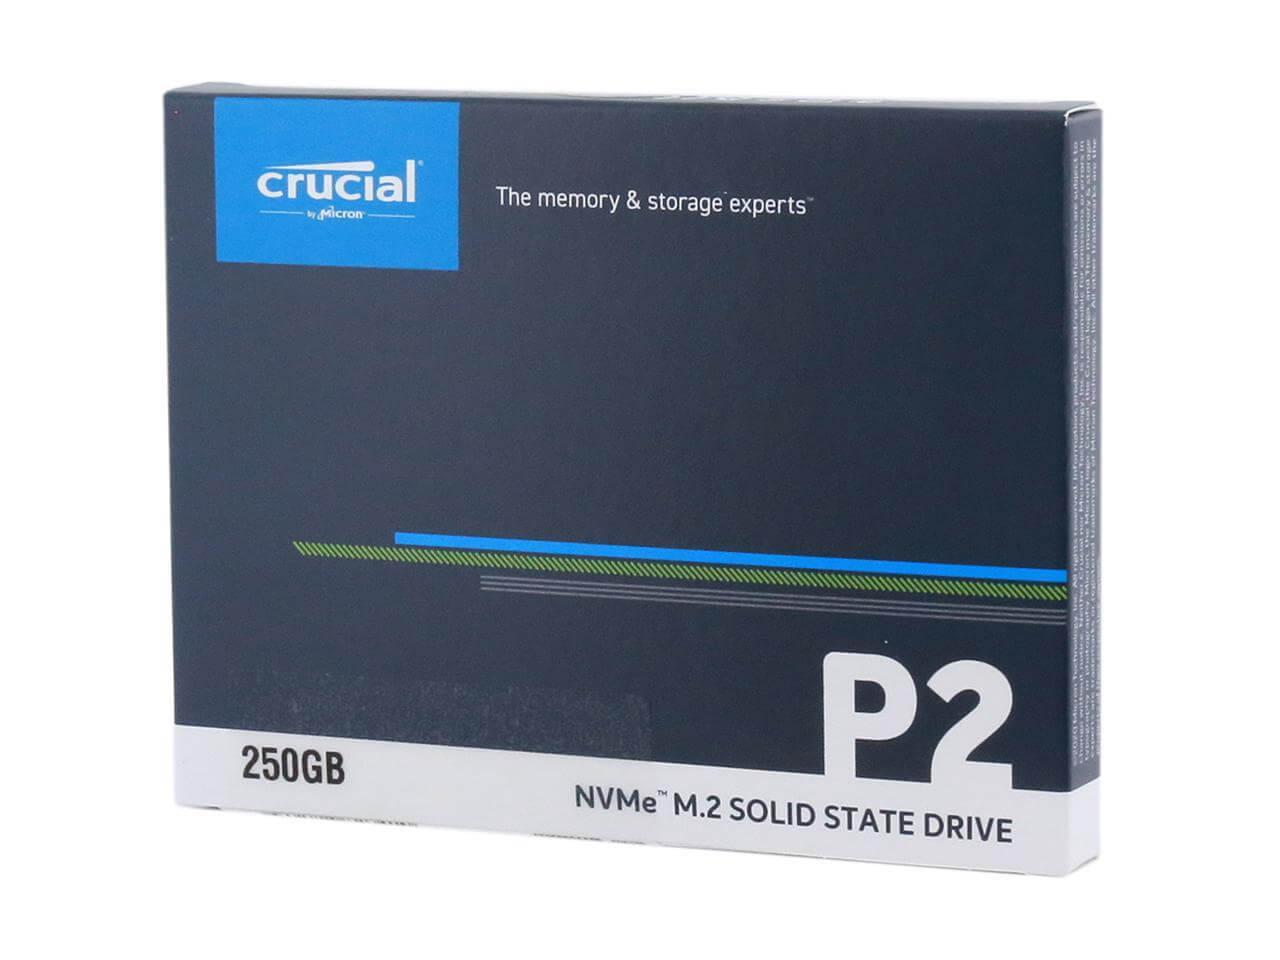 SSD CRUCIAL P2 250GB M.2 PCIE NVME NOVE